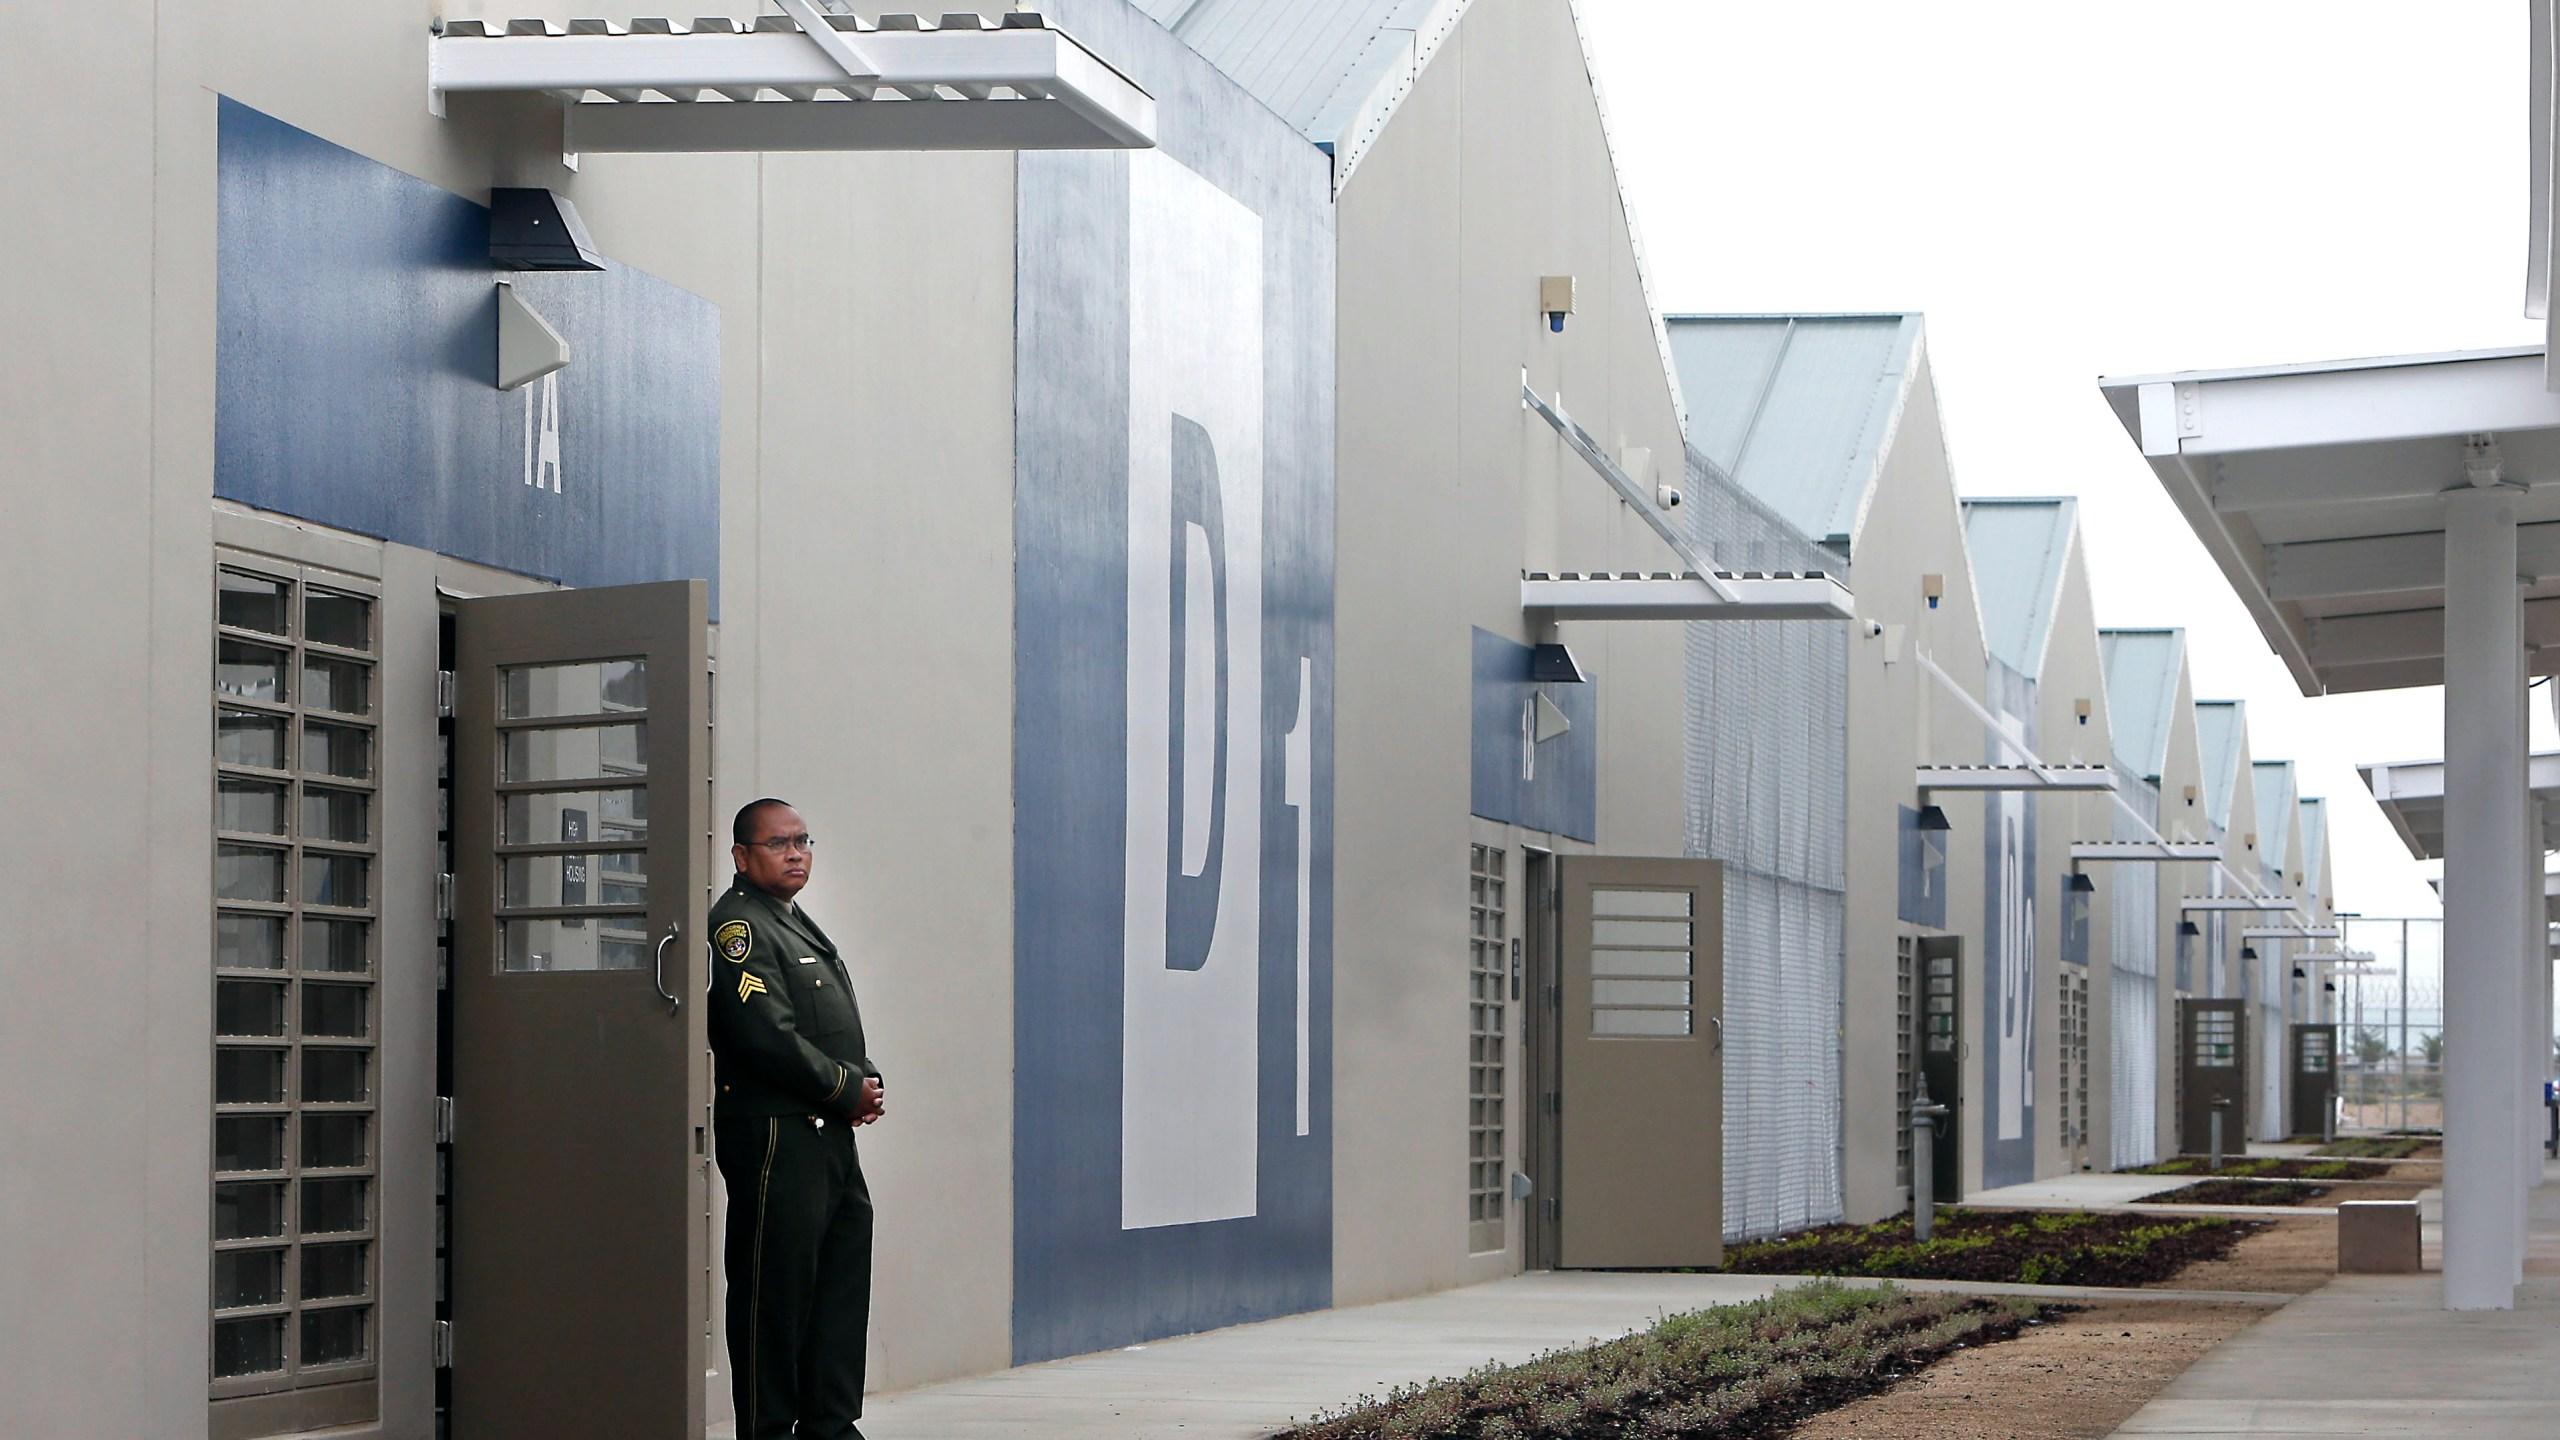 California_Prisons_Legionnaires_Disease_37774-159532.jpg16447534